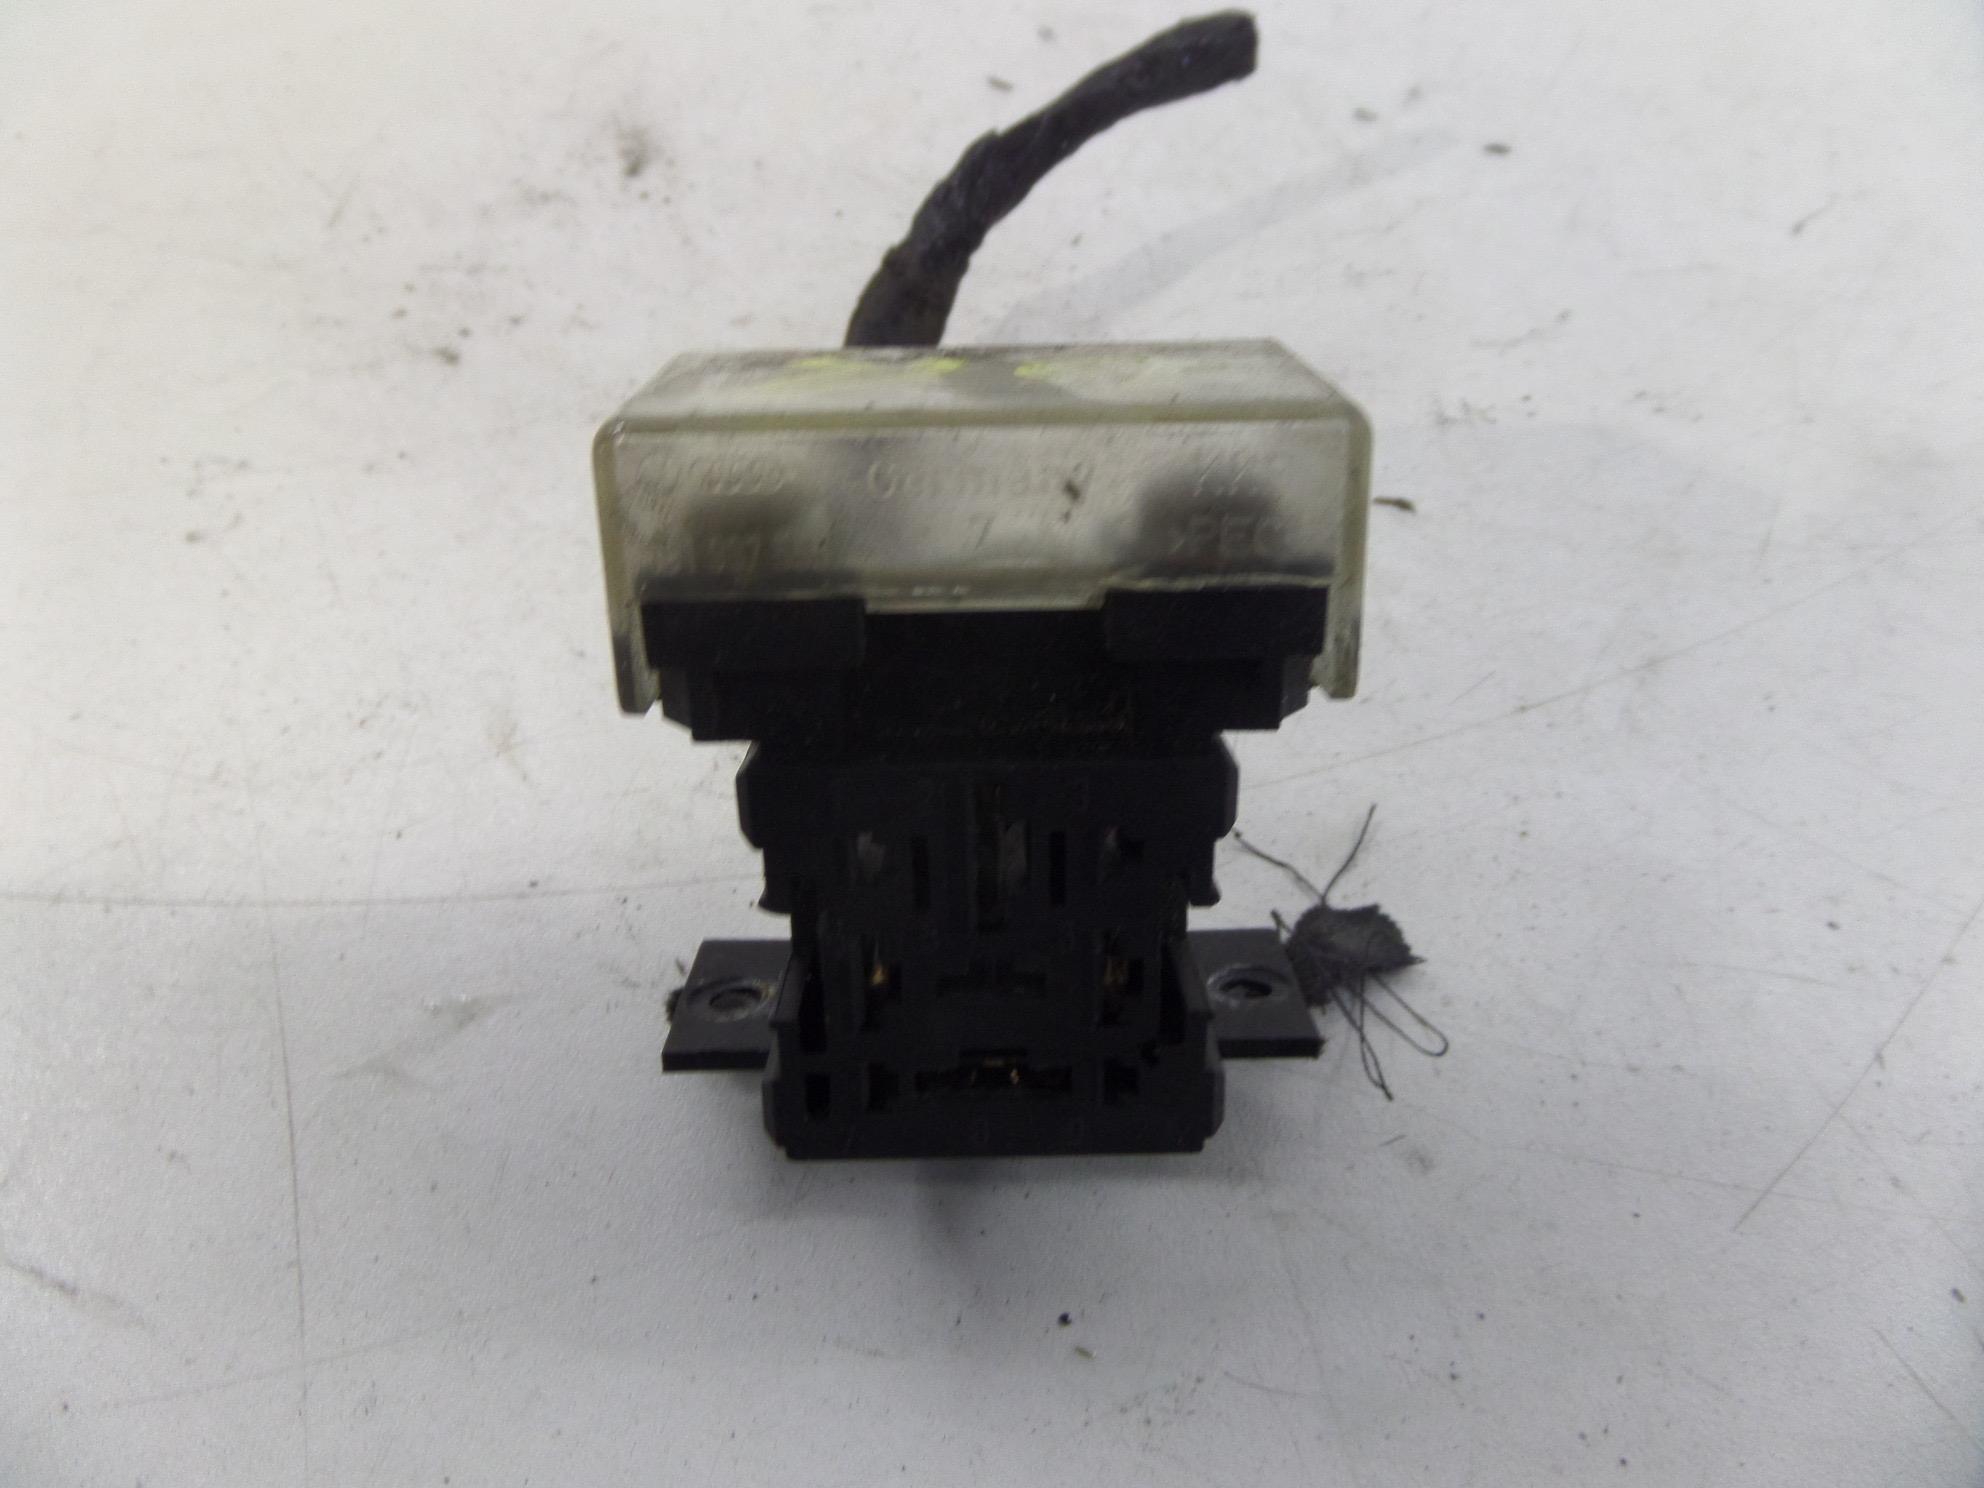 [SCHEMATICS_4JK]  VW Cabrio Fuse Box MK3.5 99-02 OEM 251 937 501 B | eBay | Vw Cabrio Fuse Box |  | eBay